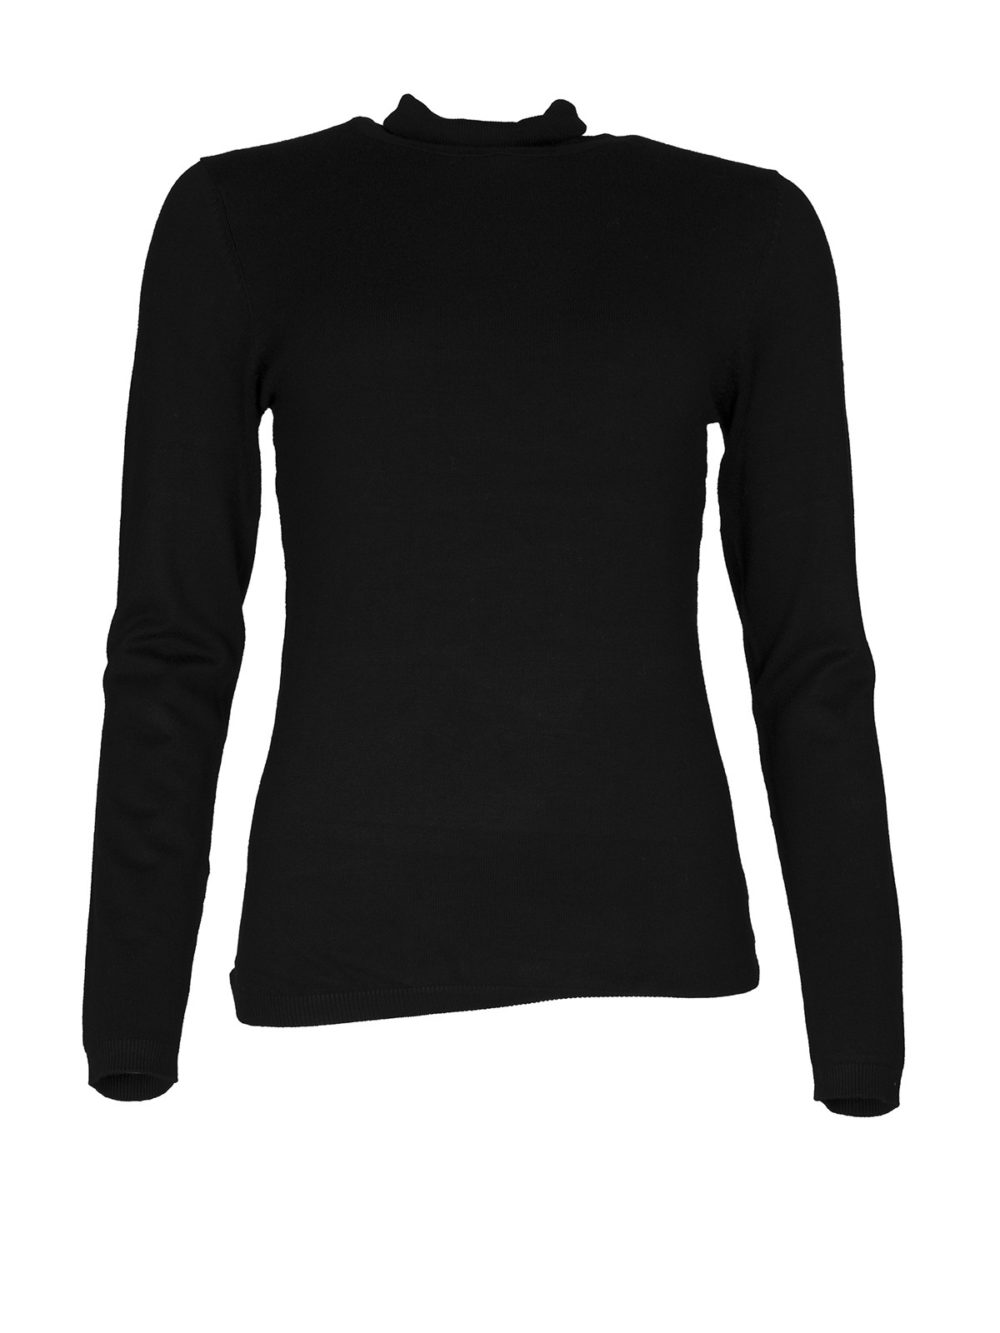 Mafa Jumper ICHI Katie Kerr Women's clothing